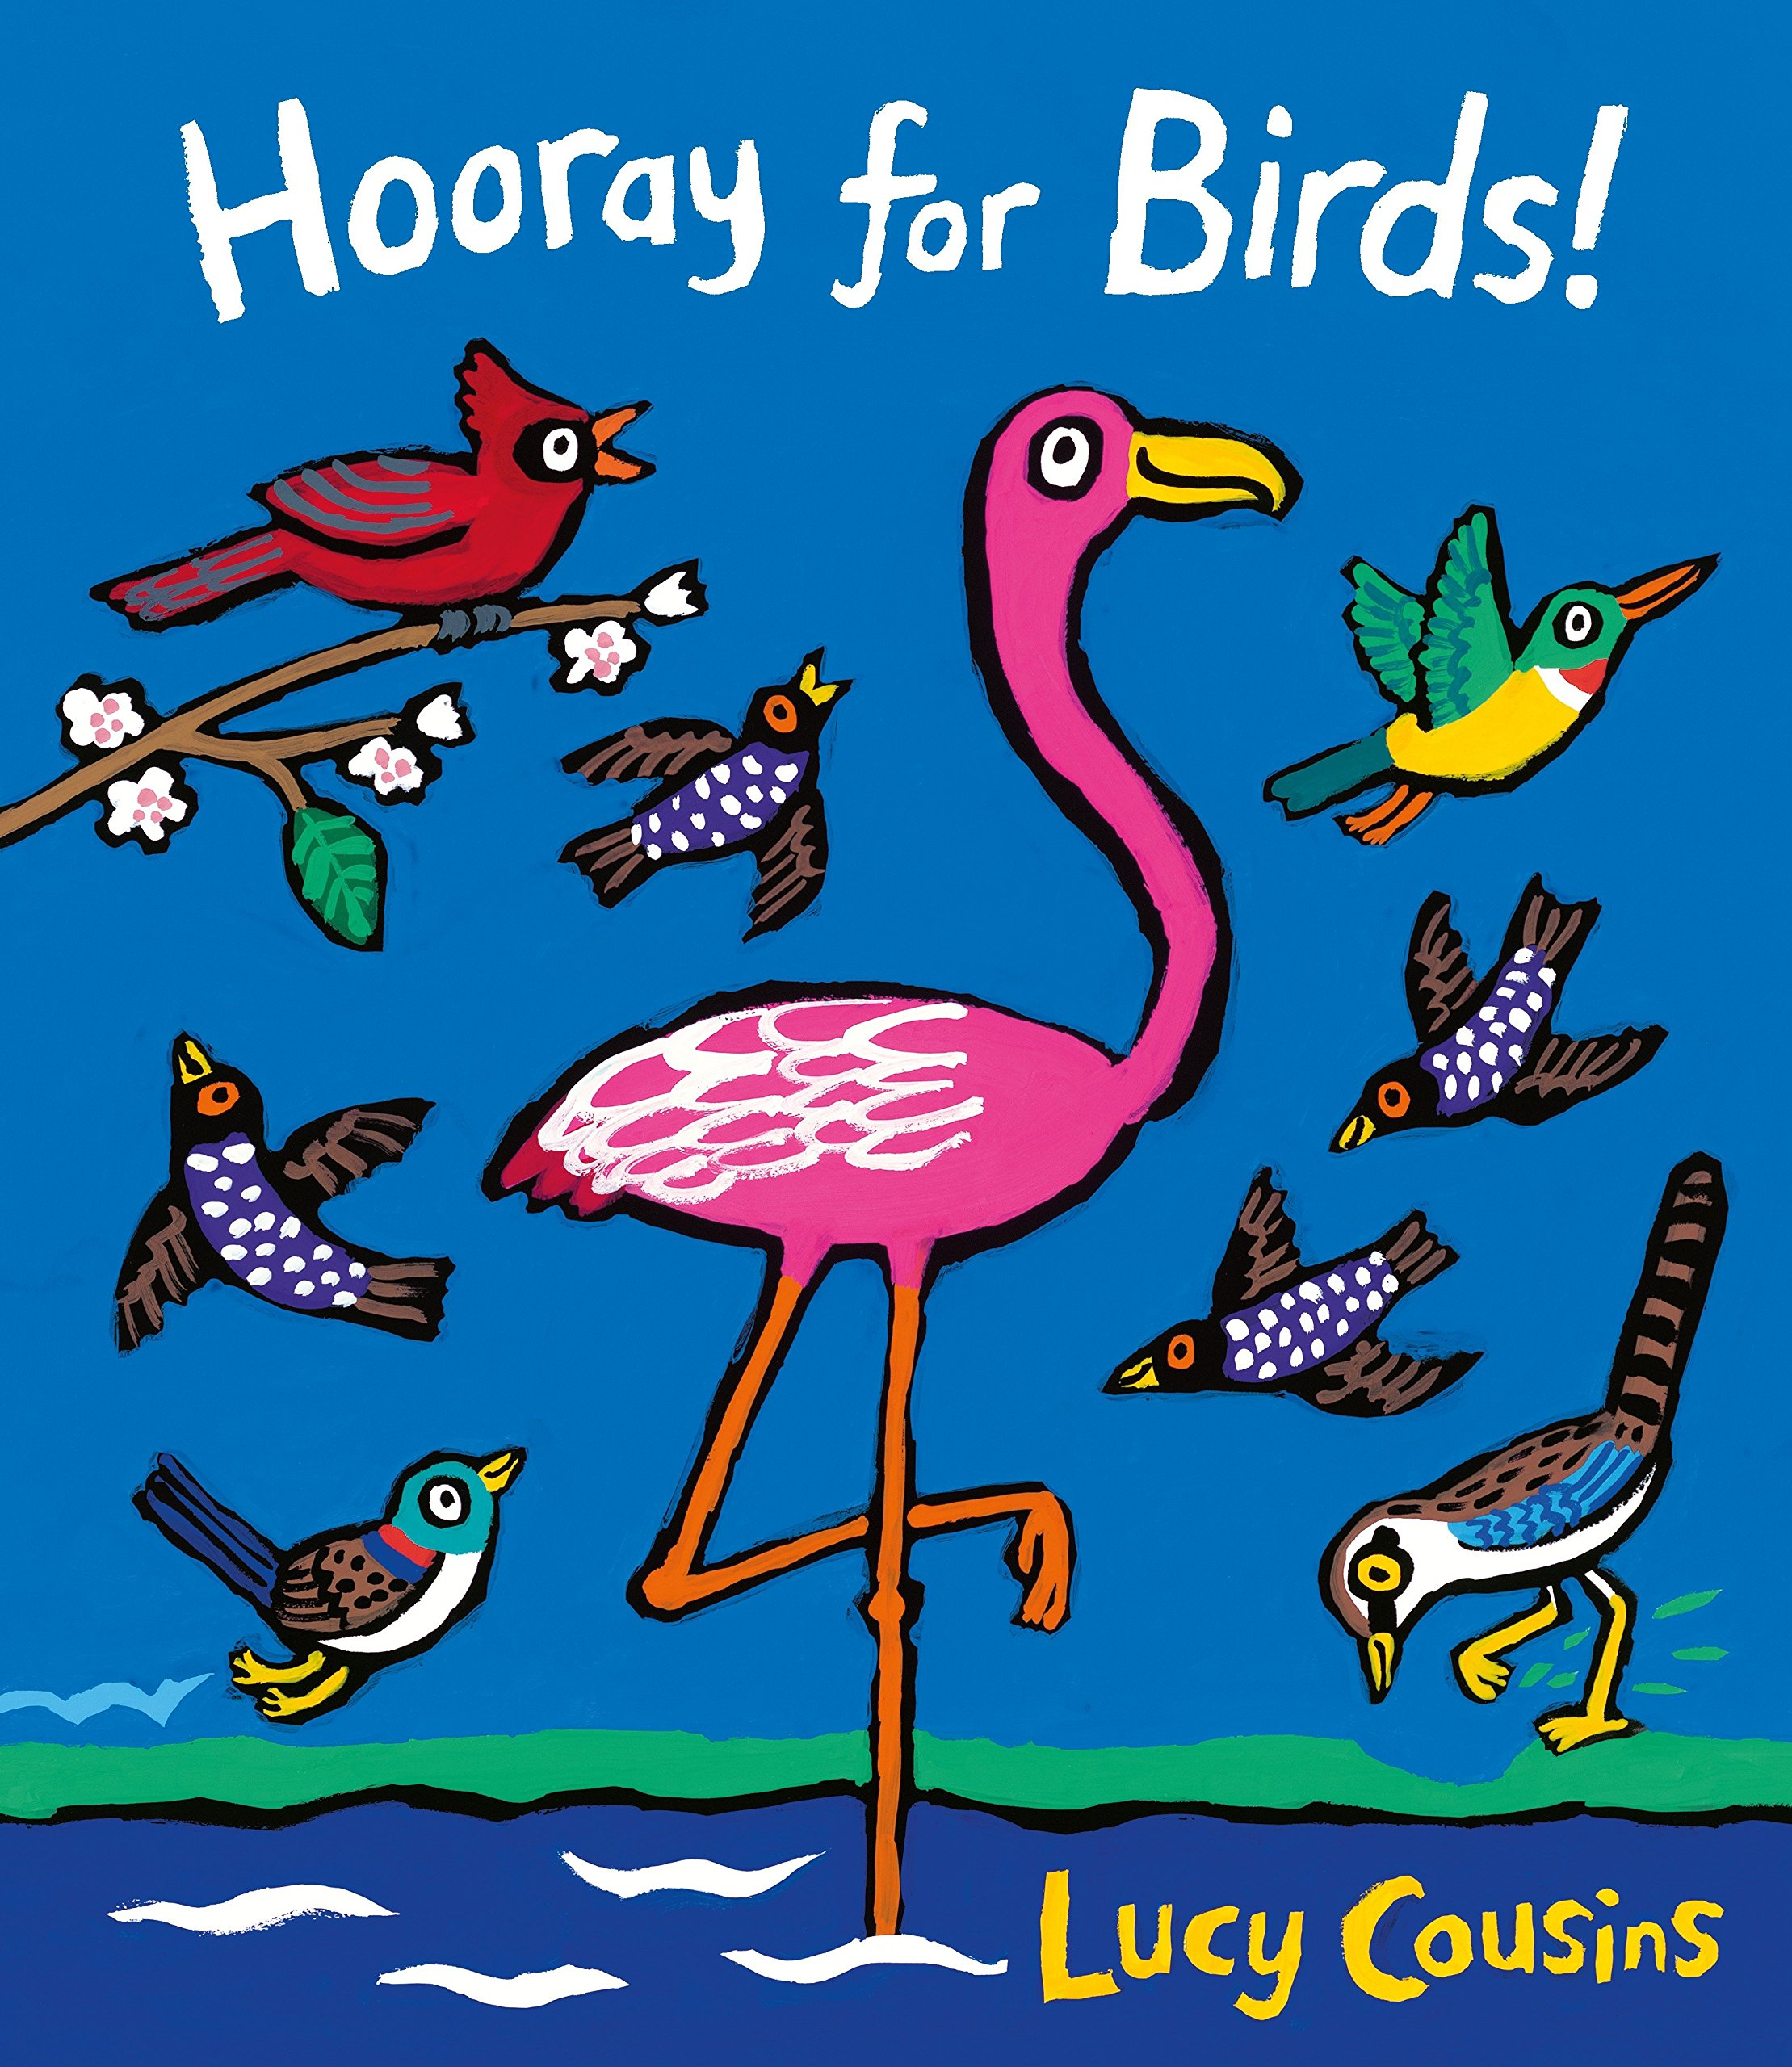 Hooray for Birds